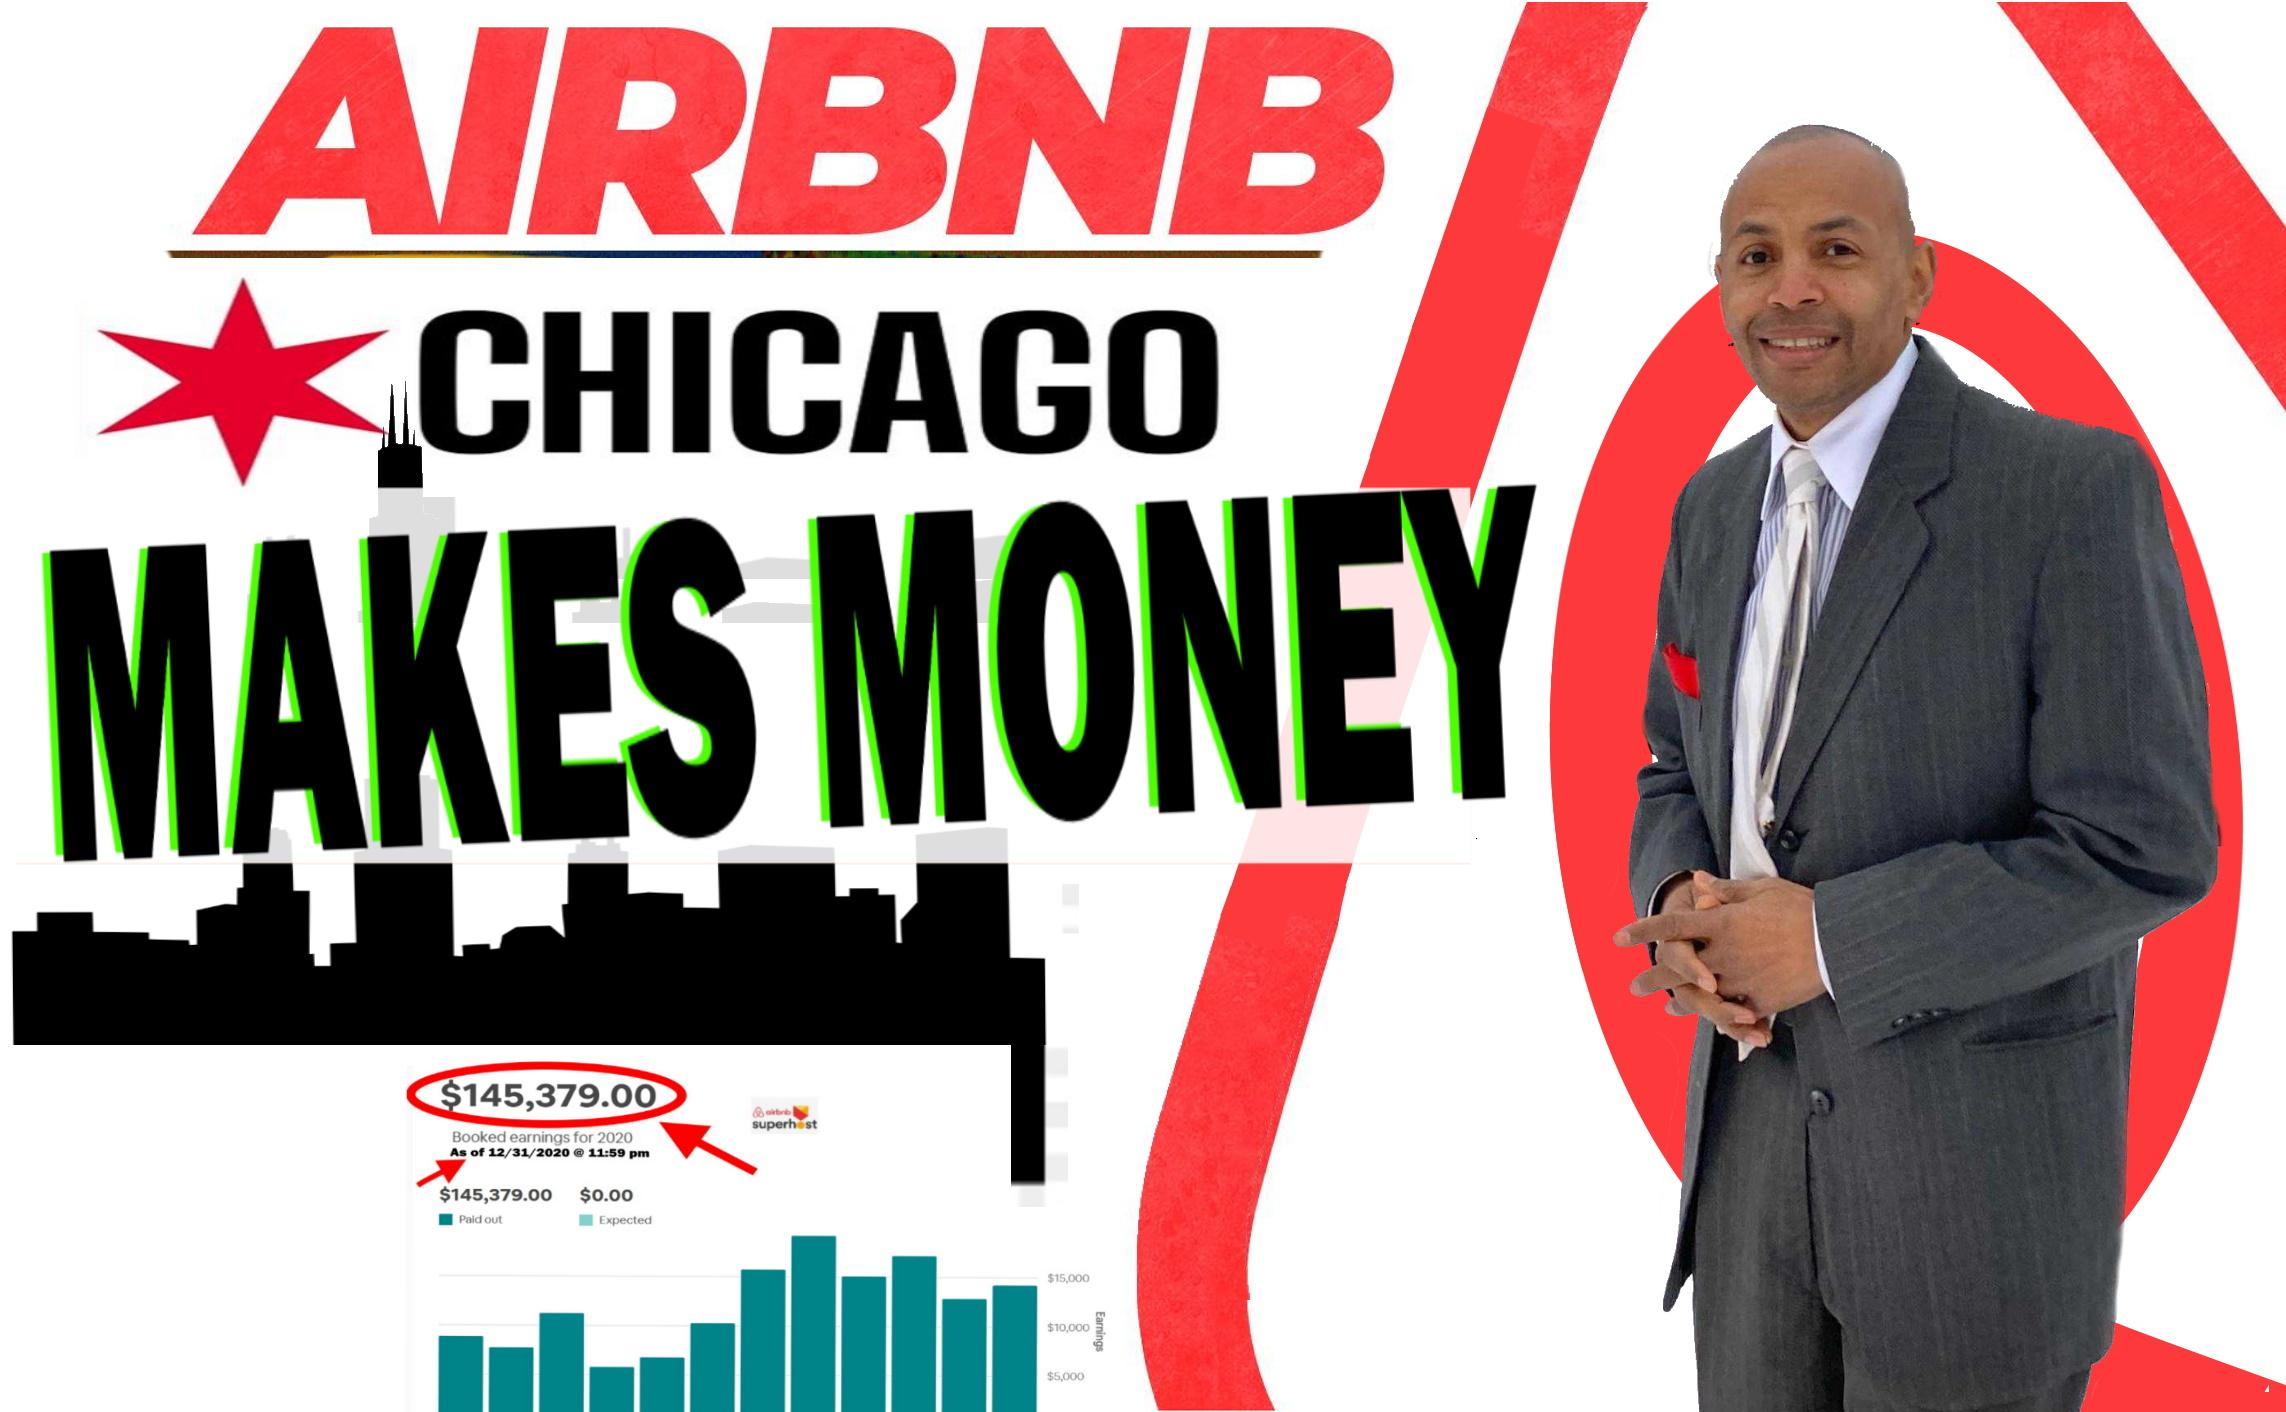 AIRBNB CHICAGO MAKES MONEY | RENTAL ARBITRAGE AIRBNB SECRETS!